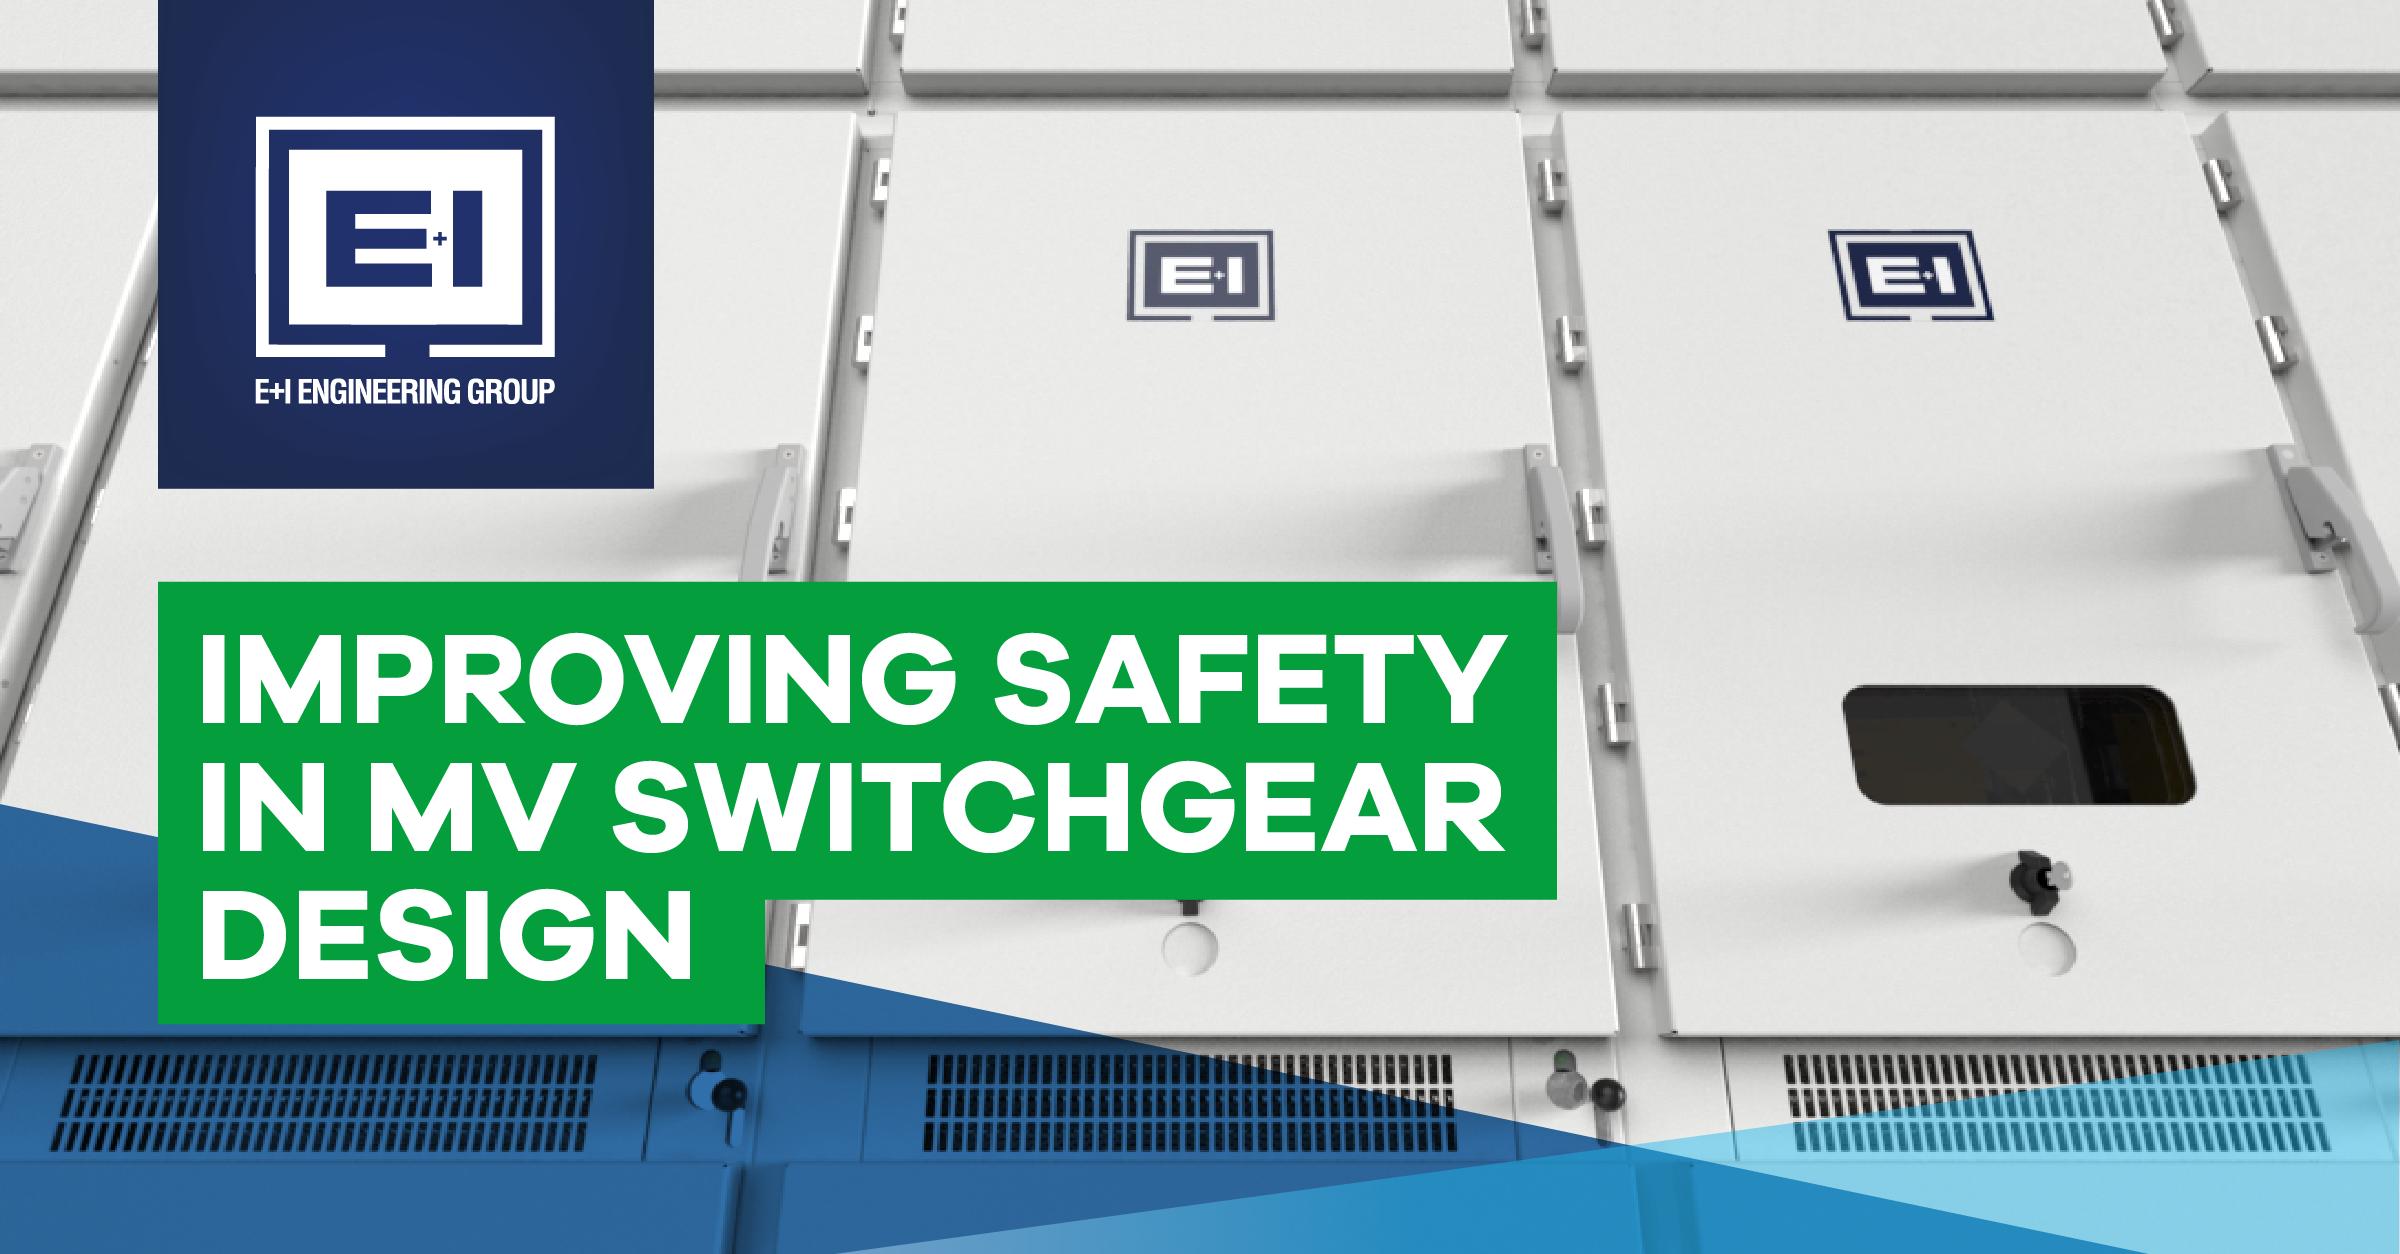 Improving Safety in MV Switchgear Design